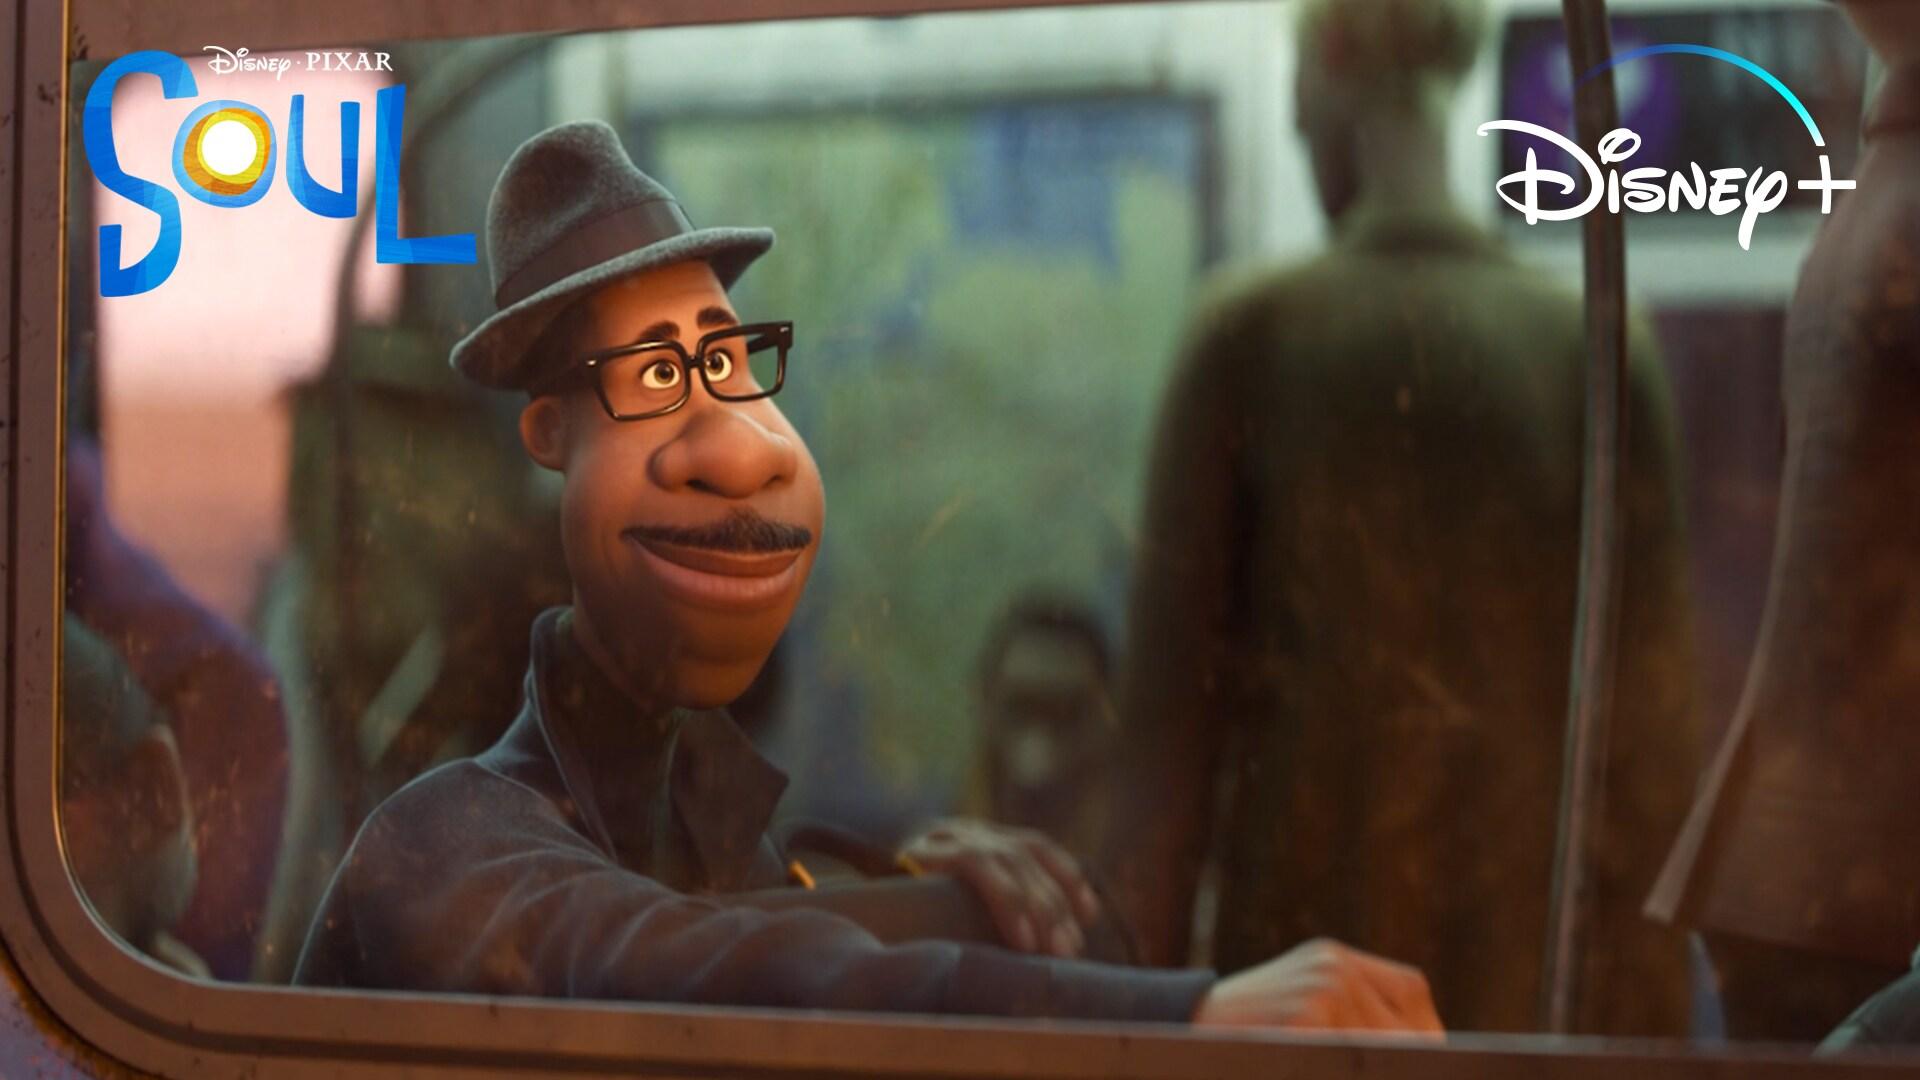 Spark | Disney and Pixar's Soul | Disney+